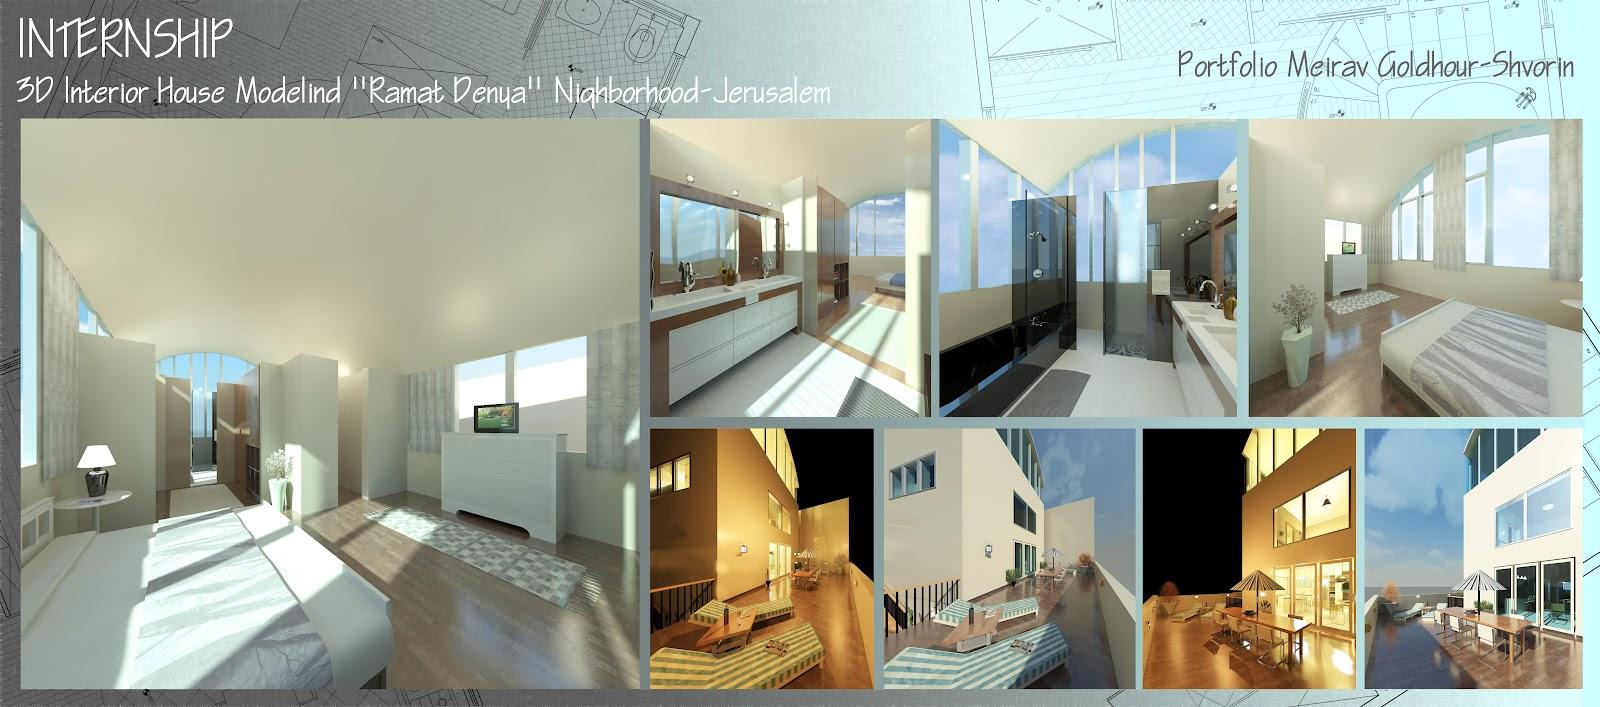 internship interior house p2